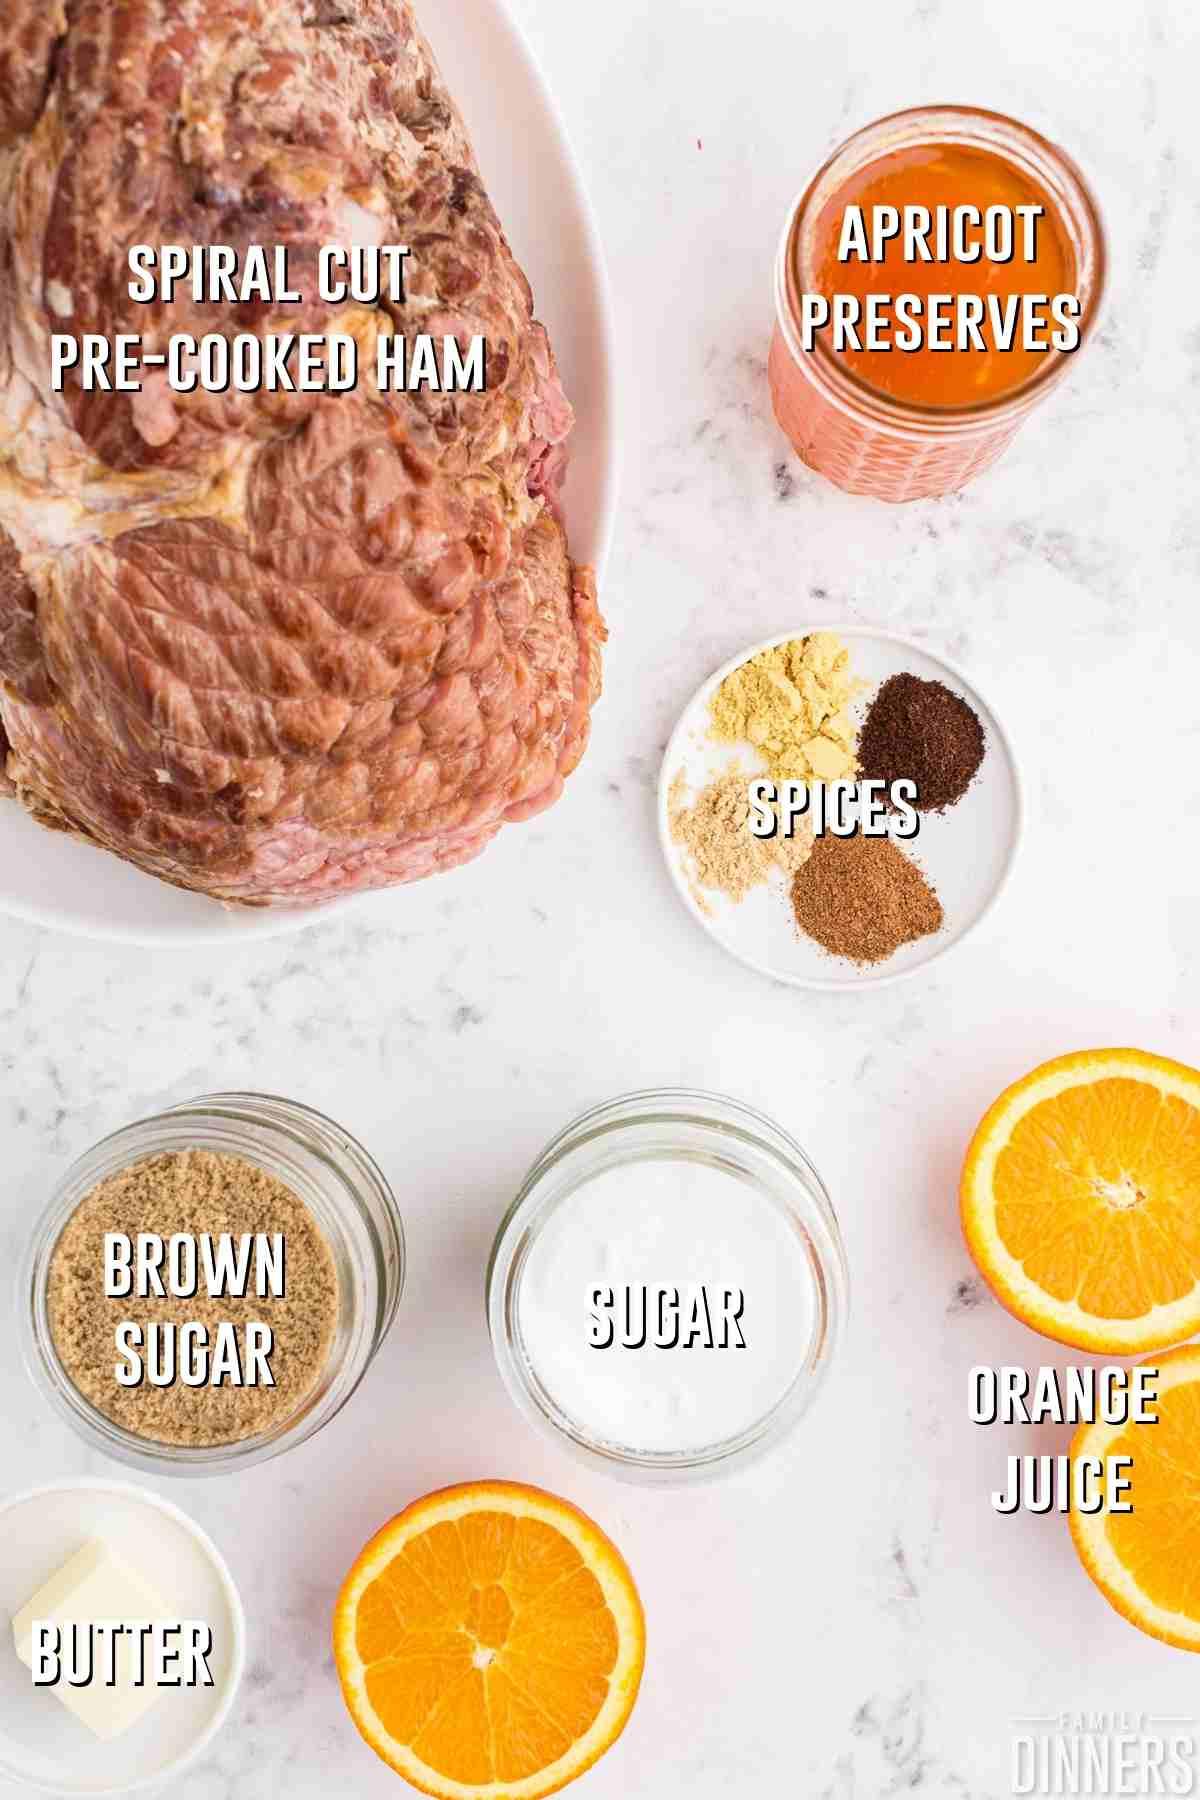 Spiral cut brown sugar glazed ham ingredients for sauce to baste ham and caramelize ham.